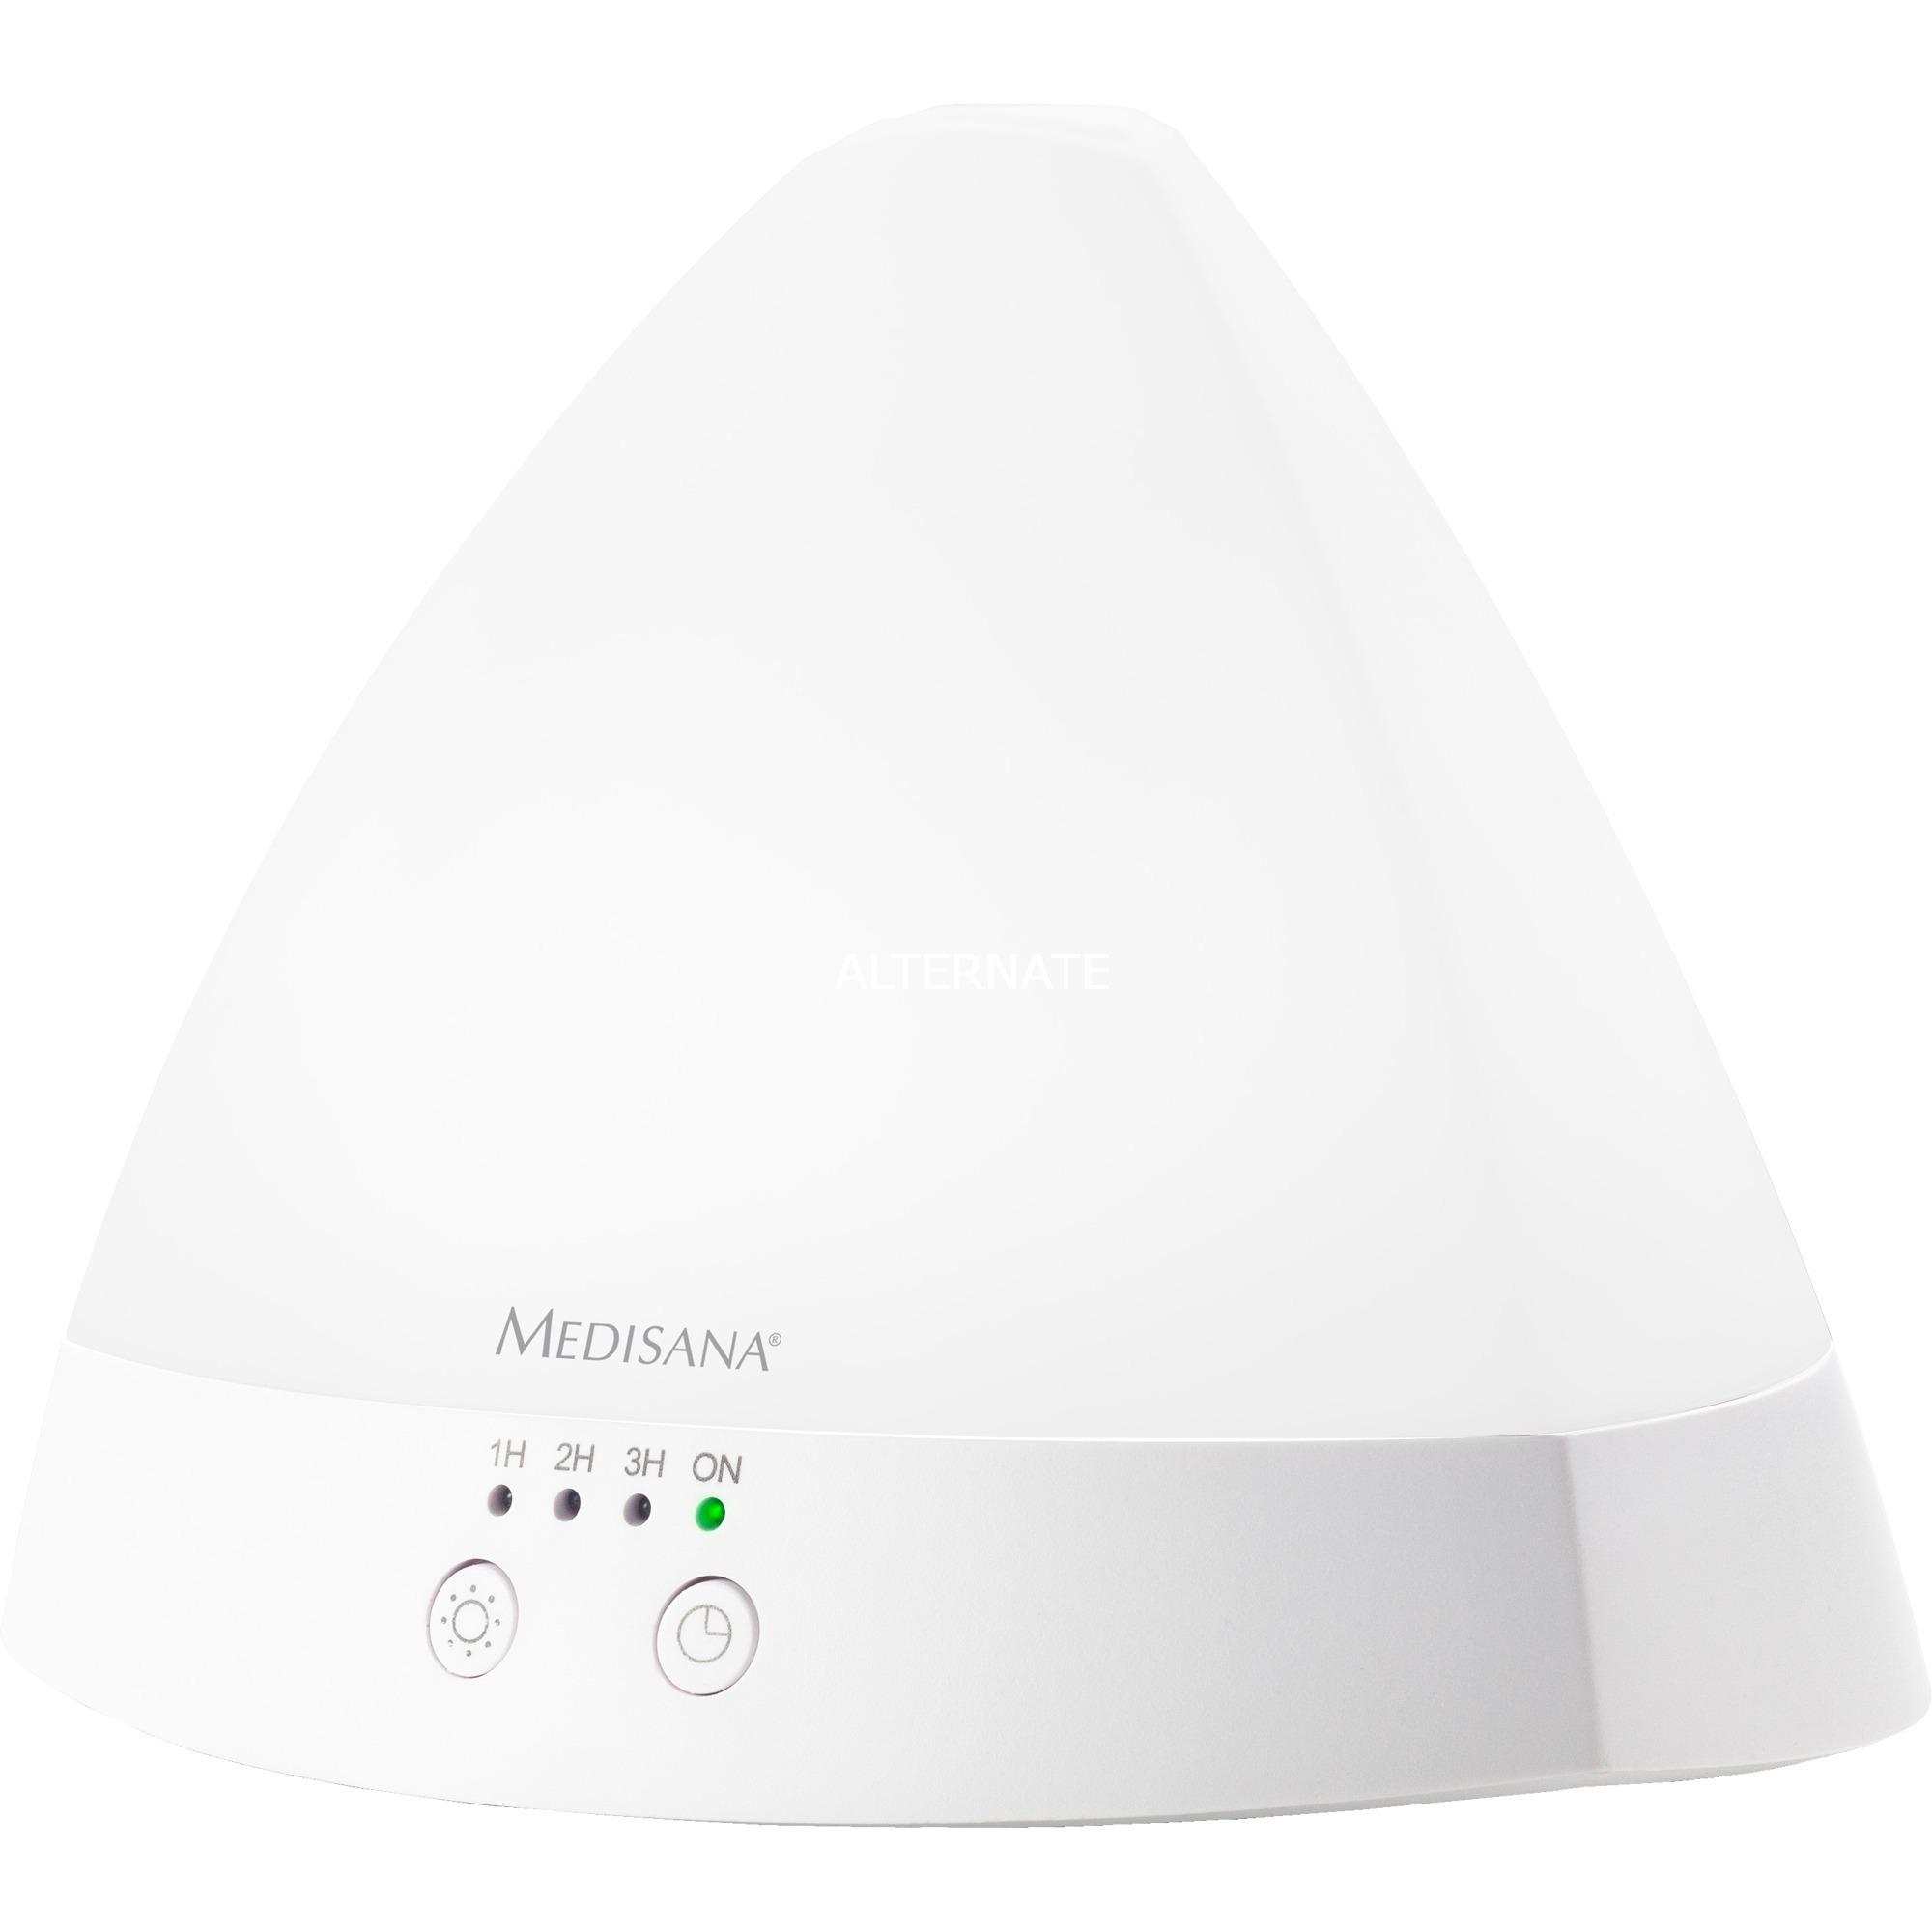 AD 630 Electric aroma lamp Blanco, Purificador de aire